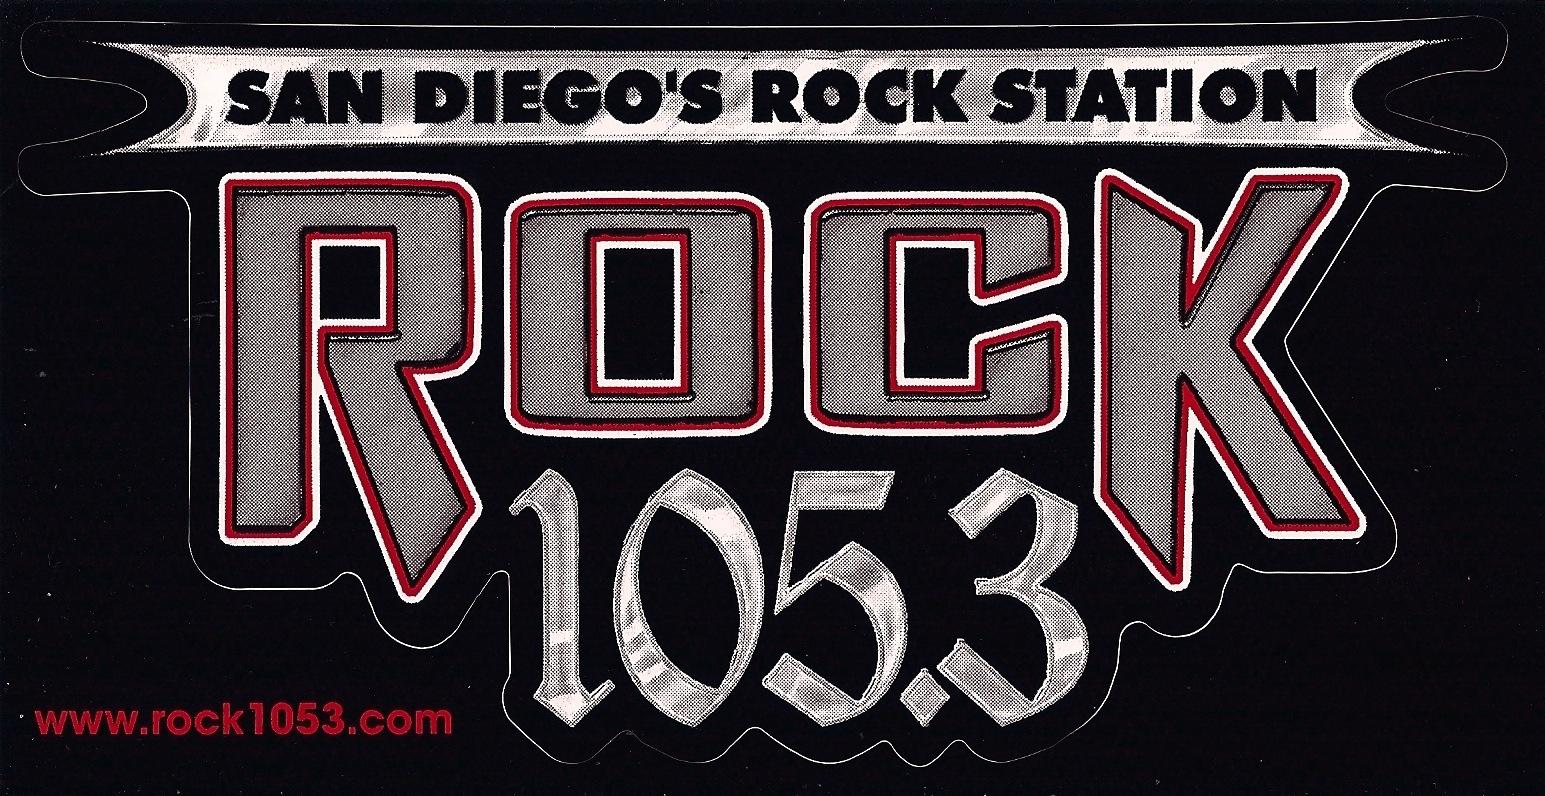 KIOZ-HD2 - Nitro Rock 105.3 FM San Diego, CA Radio Online